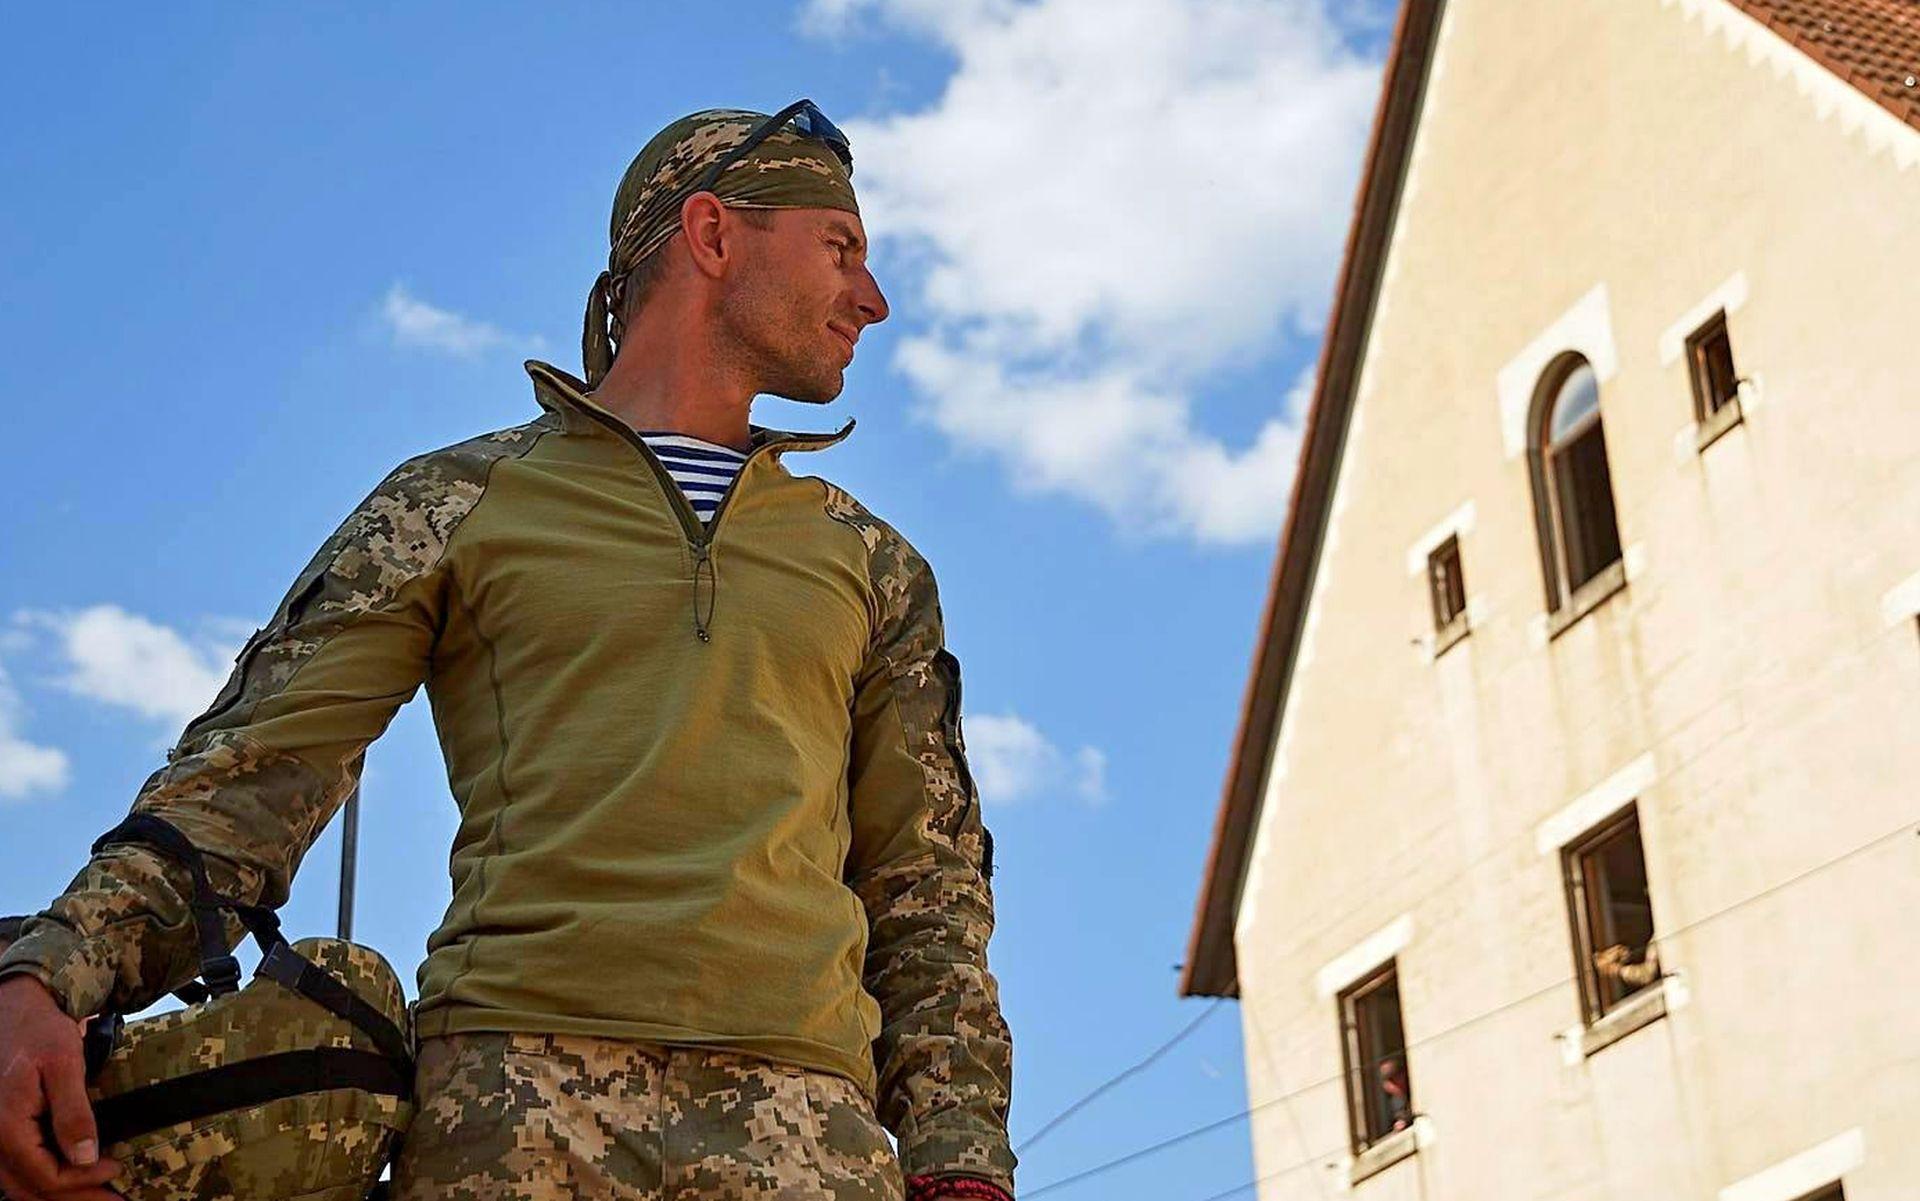 Ukraїnśka armija za 7 dniv: vid obladnannja dlja rozvidky do našyh litakiv dlja SŠA